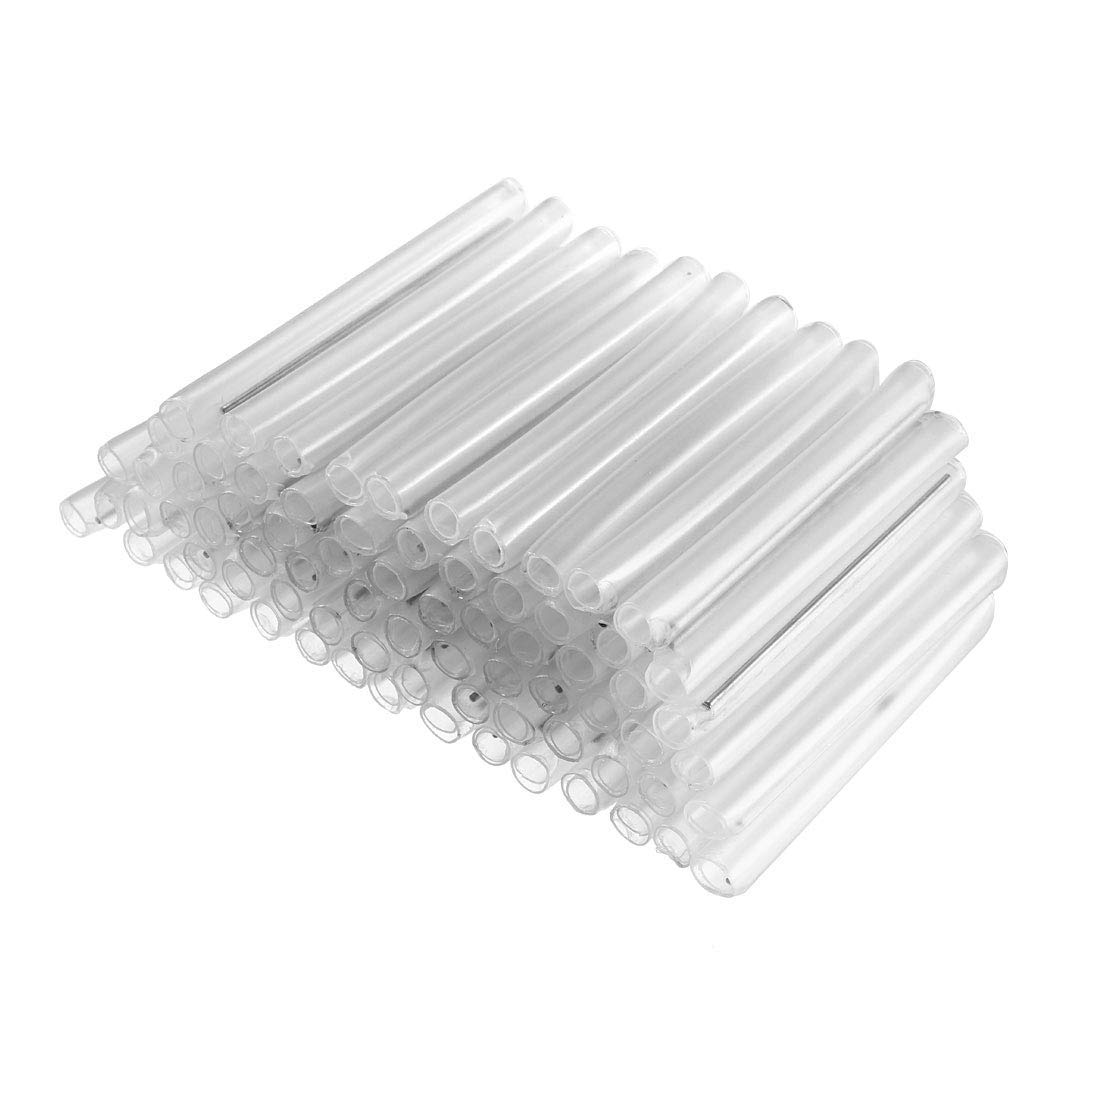 EUNOZAMY 58mm 5.6mmOD Fundas protectoras de tubo de empalme de fibra /óptica Fusion Tubo termorretr/áctil transparente 400pcs